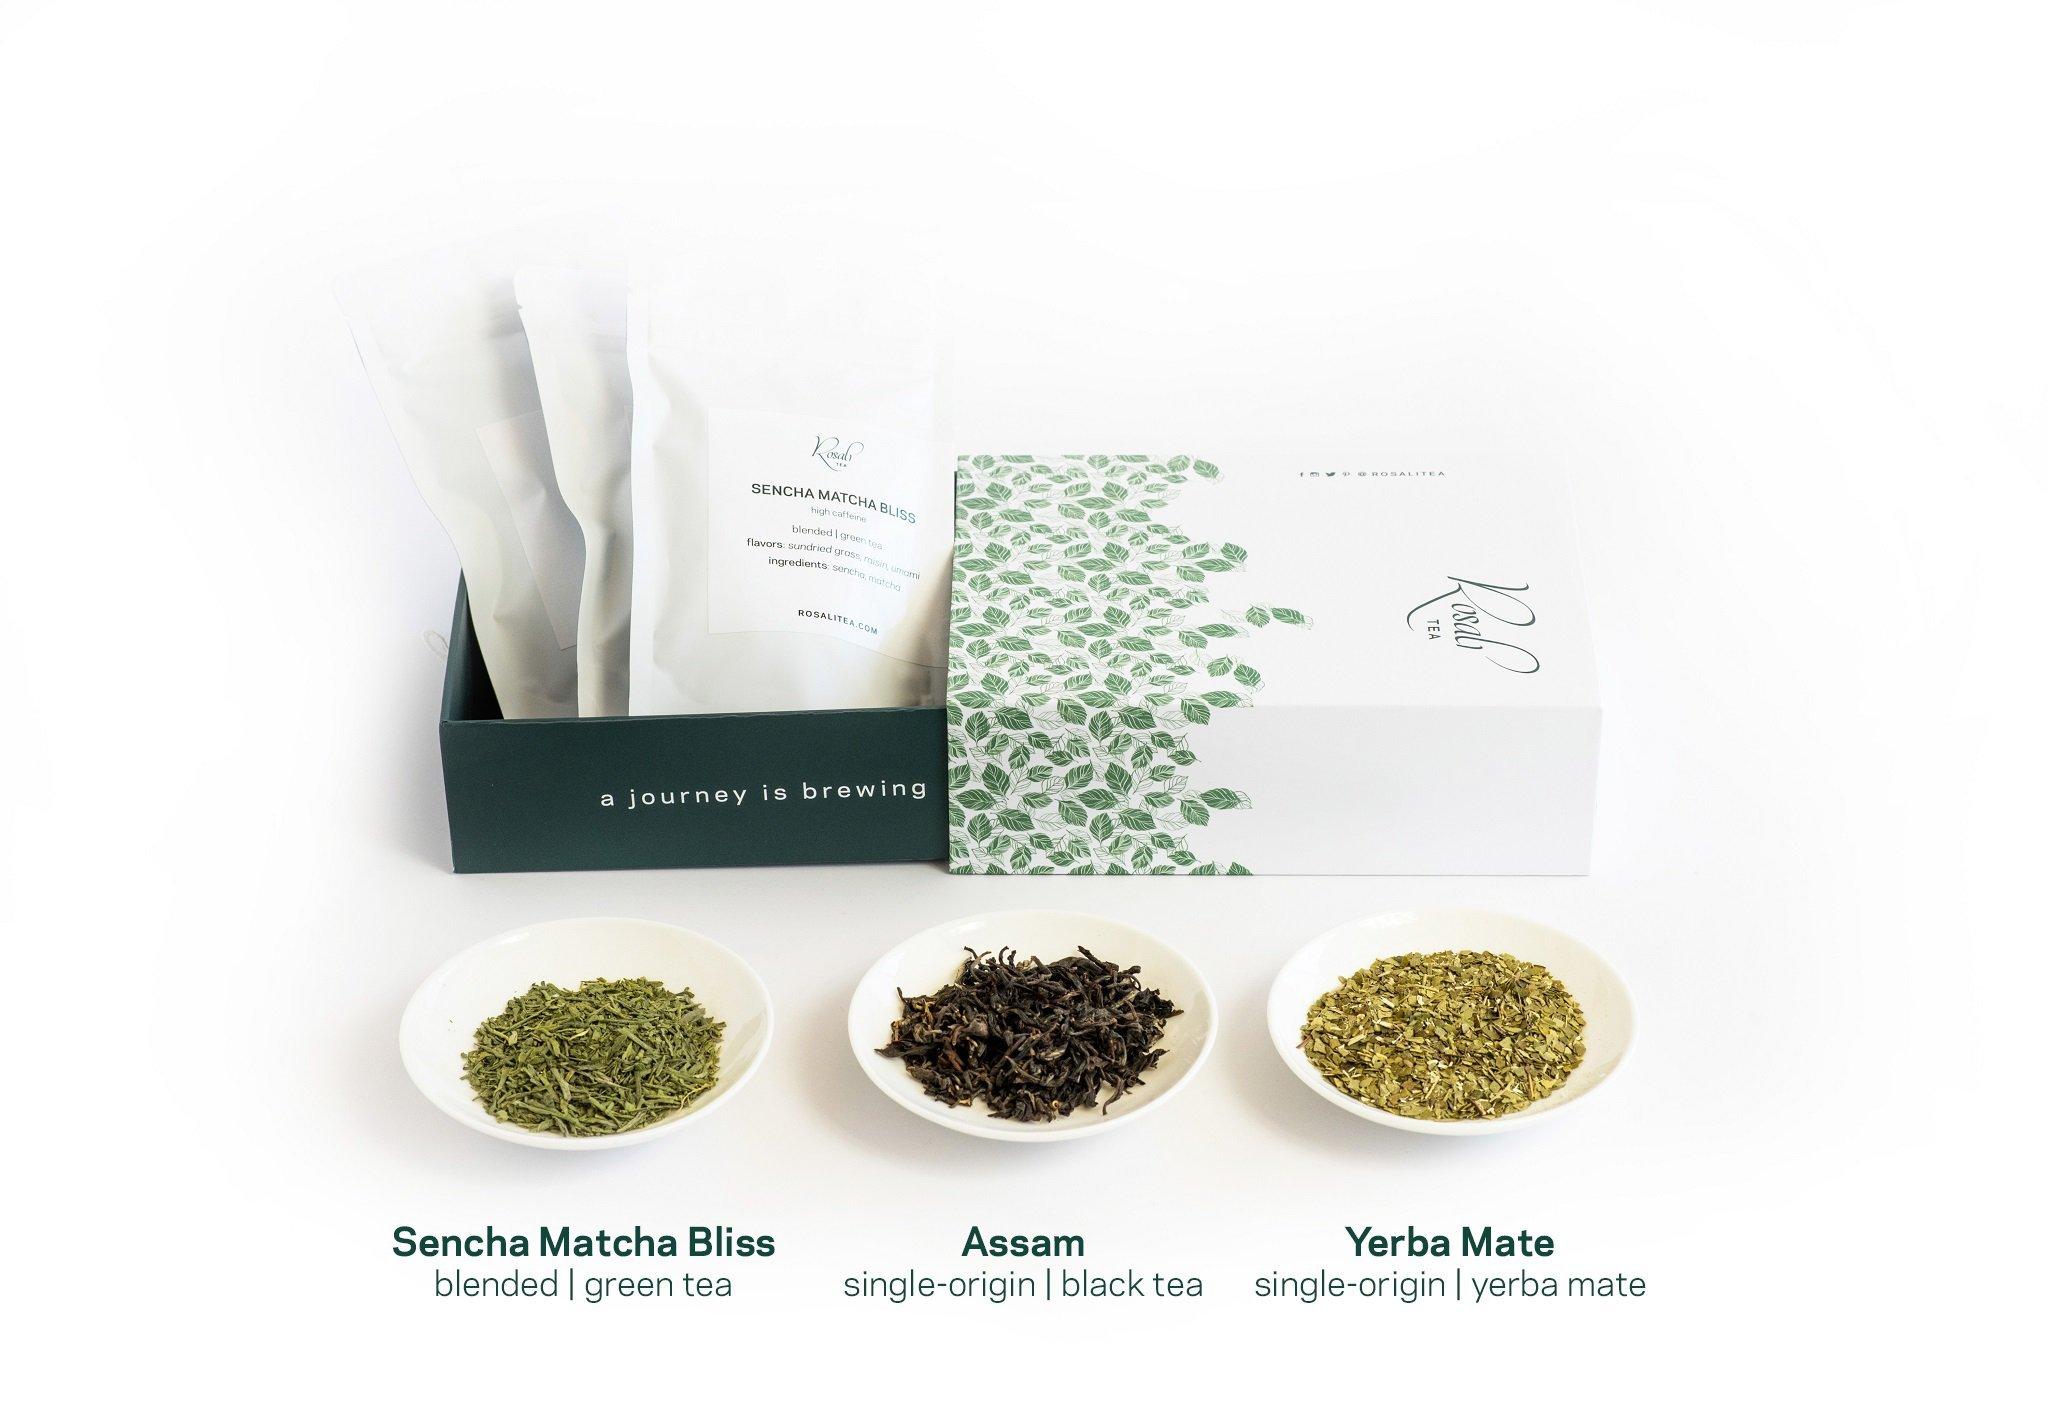 Rosali Tea Gift Box - Premium Loose-Leaf Tea Sampler with 3 Teas, a Wooden Teaspoon and Filters, Energy Box